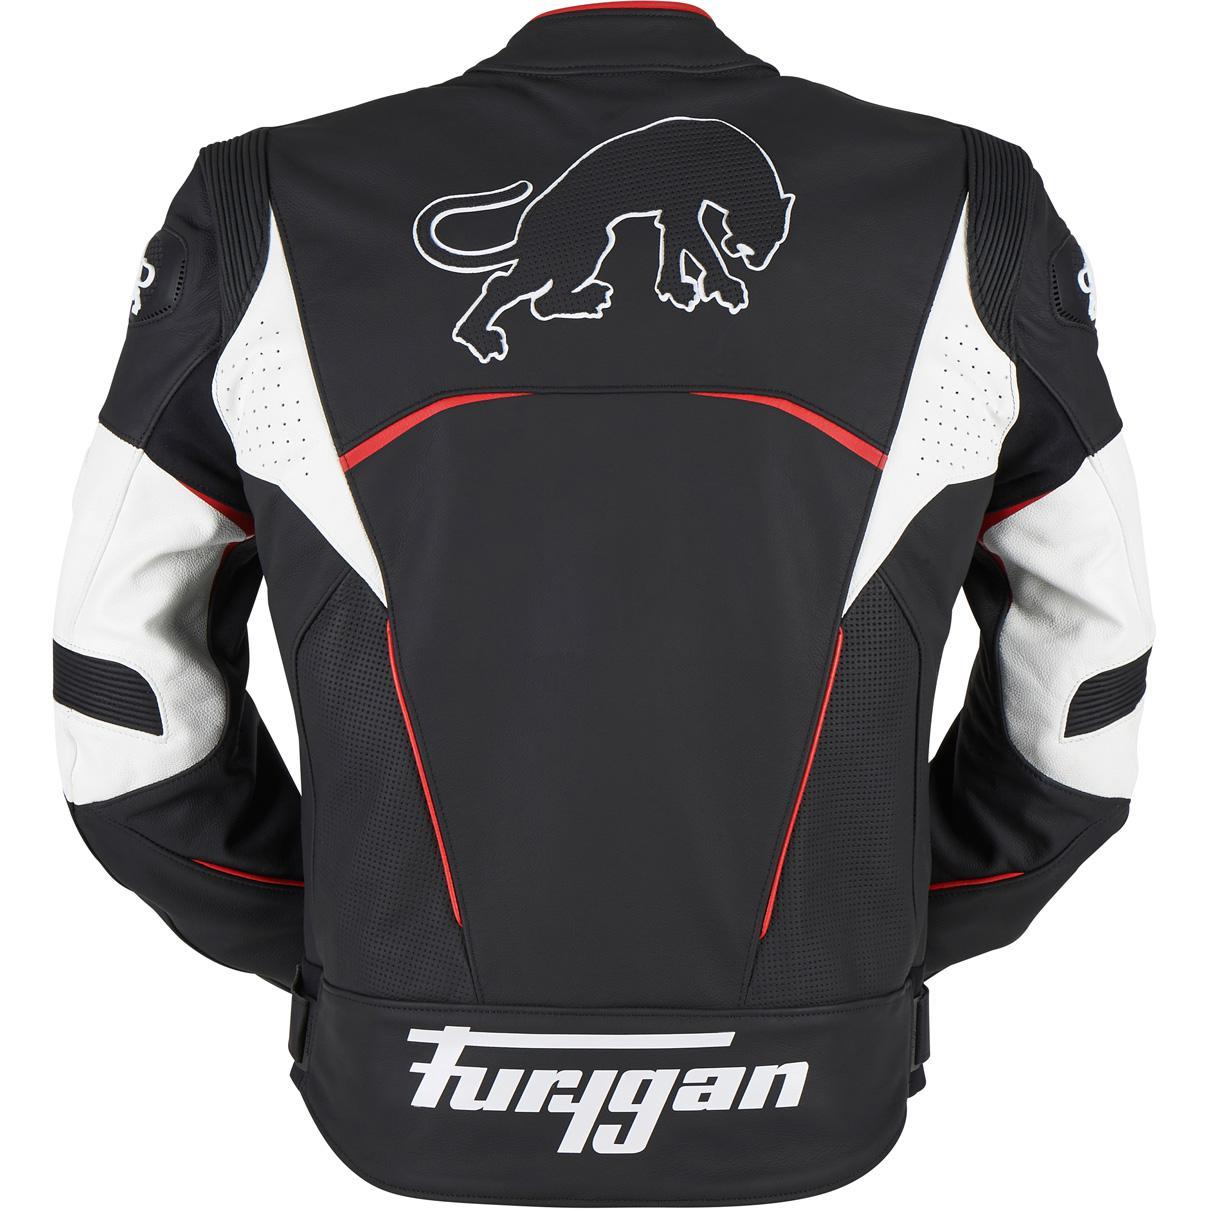 FURYGAN-blouson-ork-image-10685969